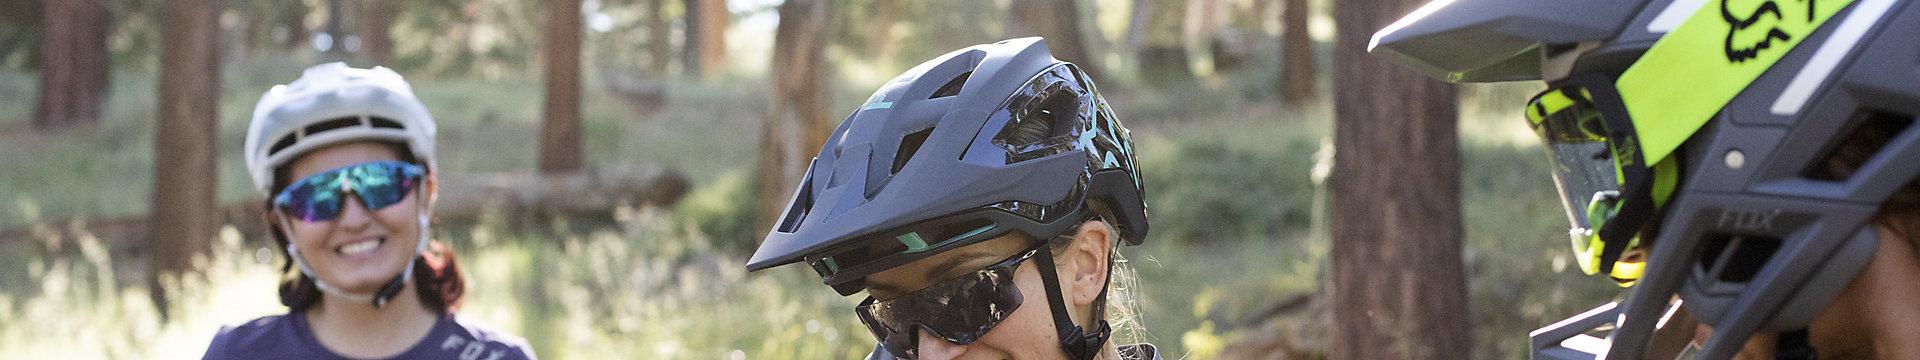 Womens MTB Helmets